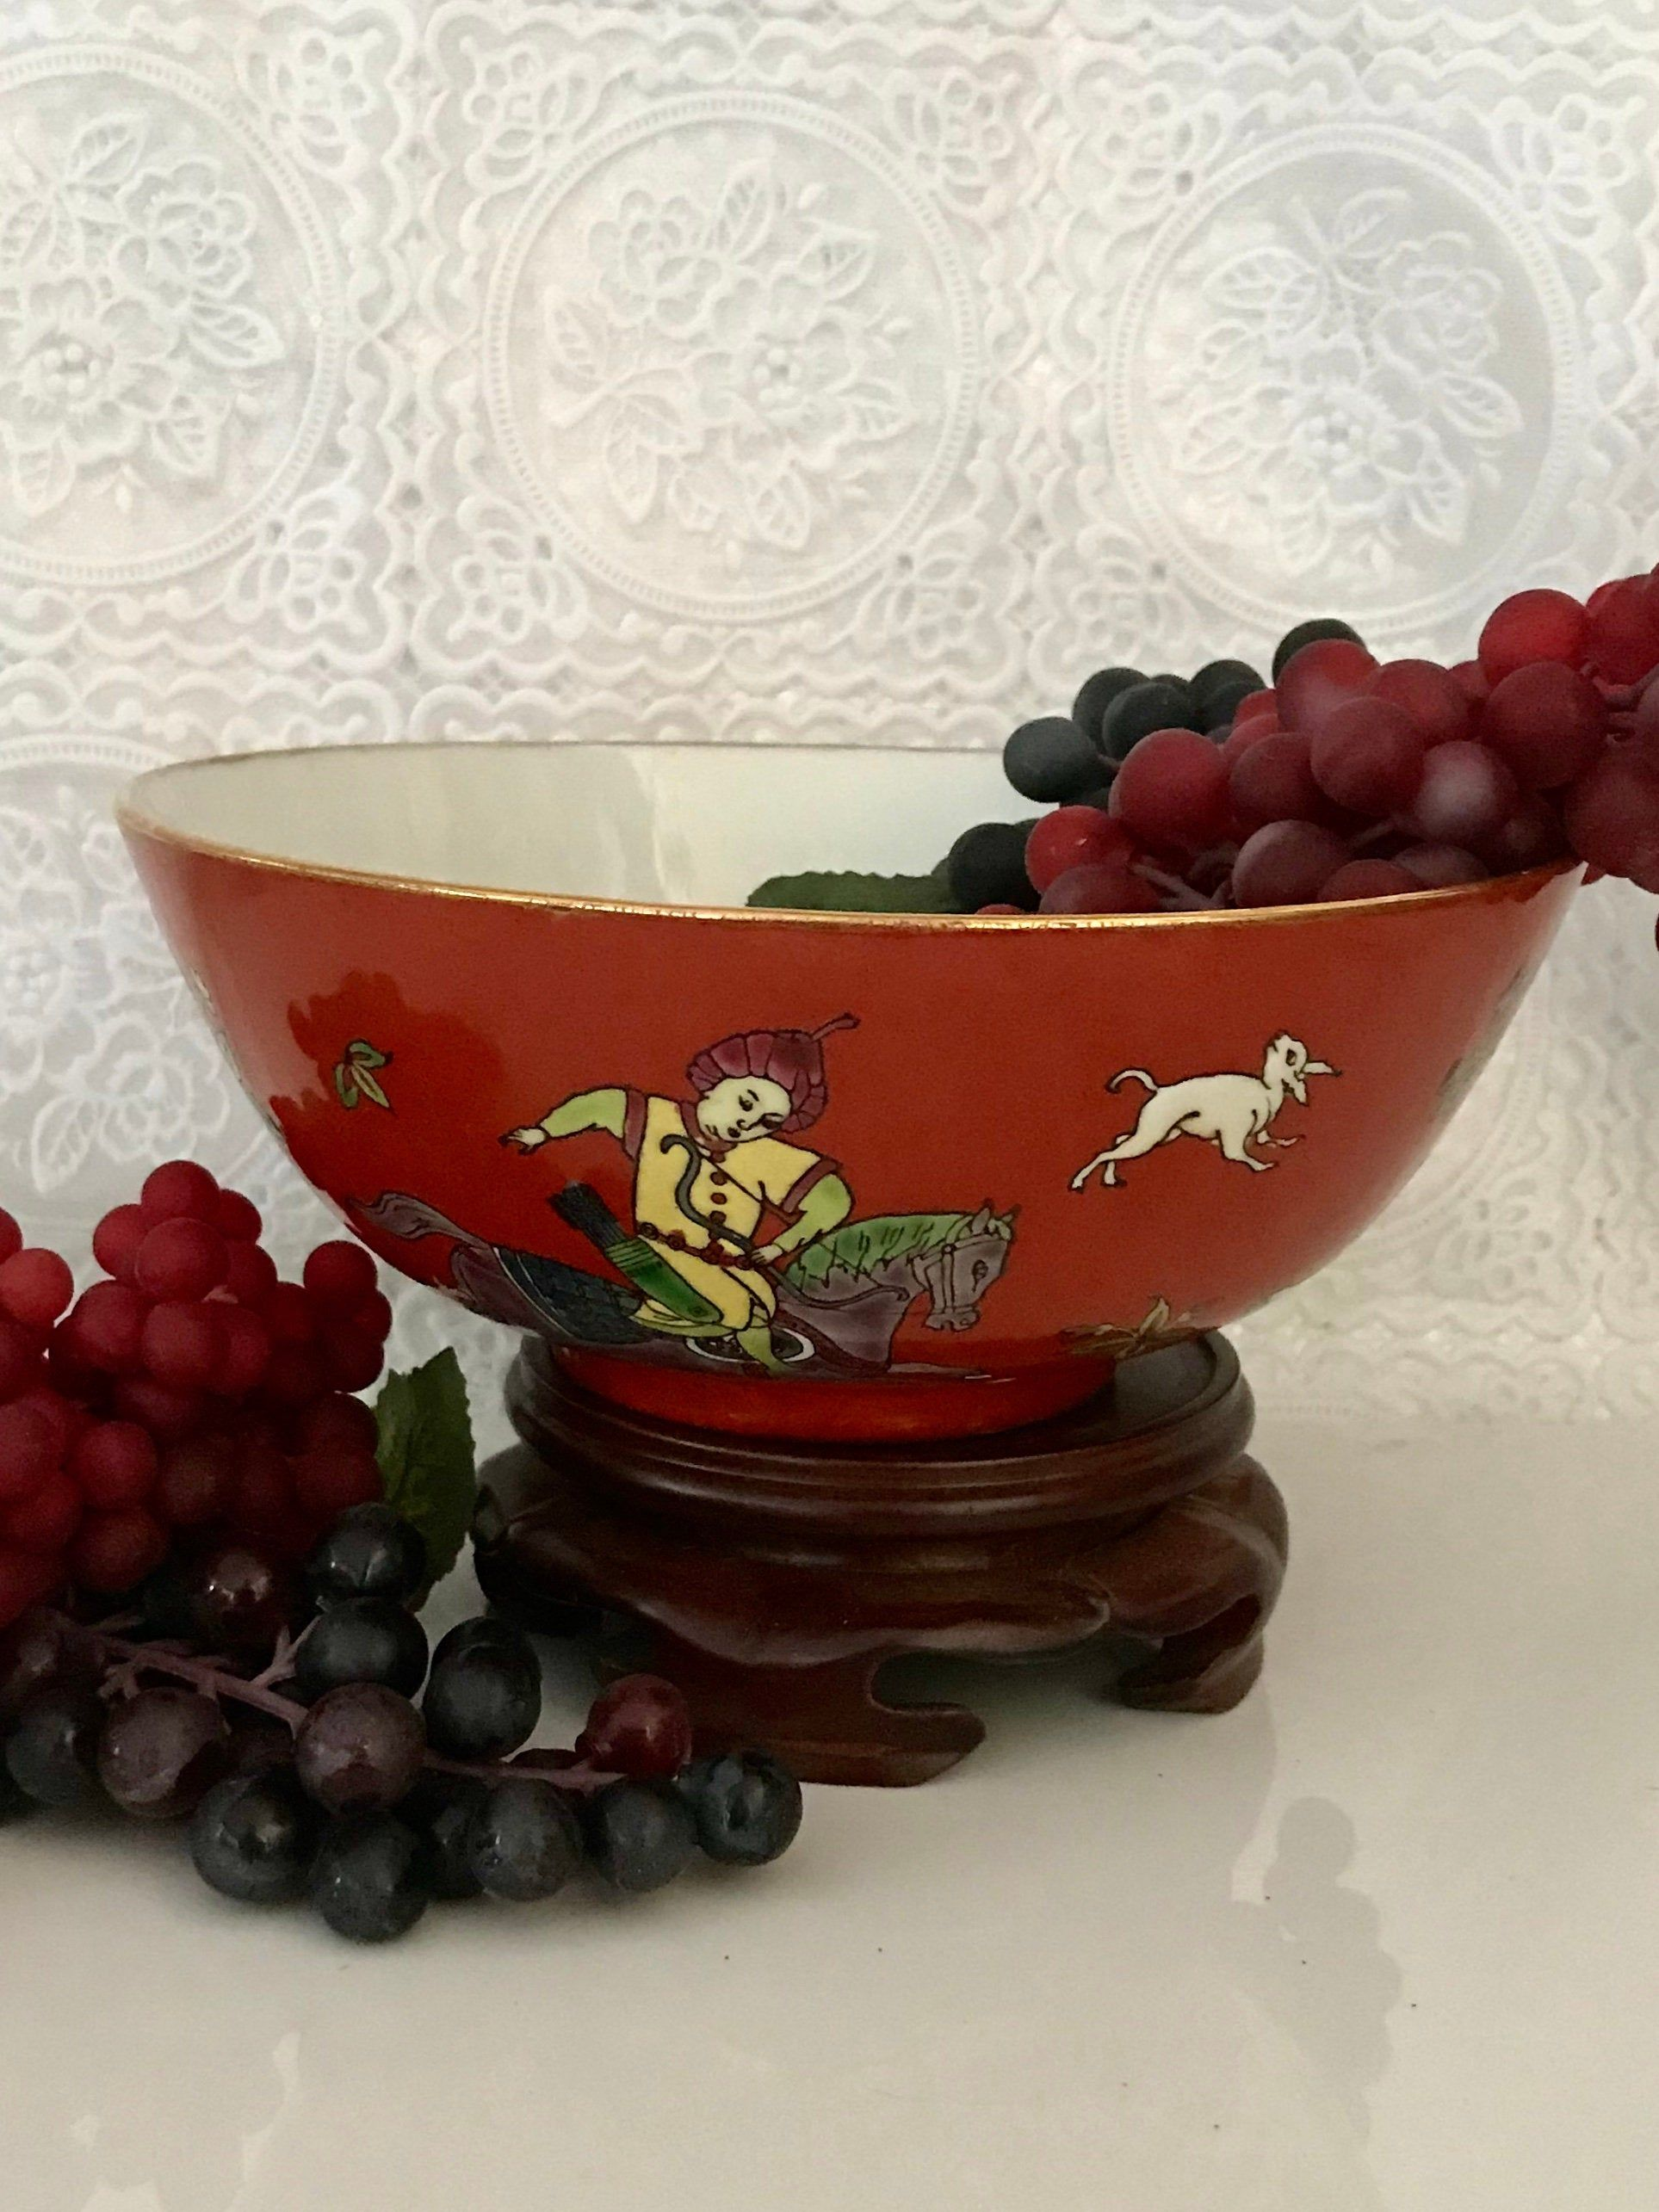 Japanese ceramic bowl vintage replacements kitchen wares oriental noodle  soup bowl decorated Hong Kong